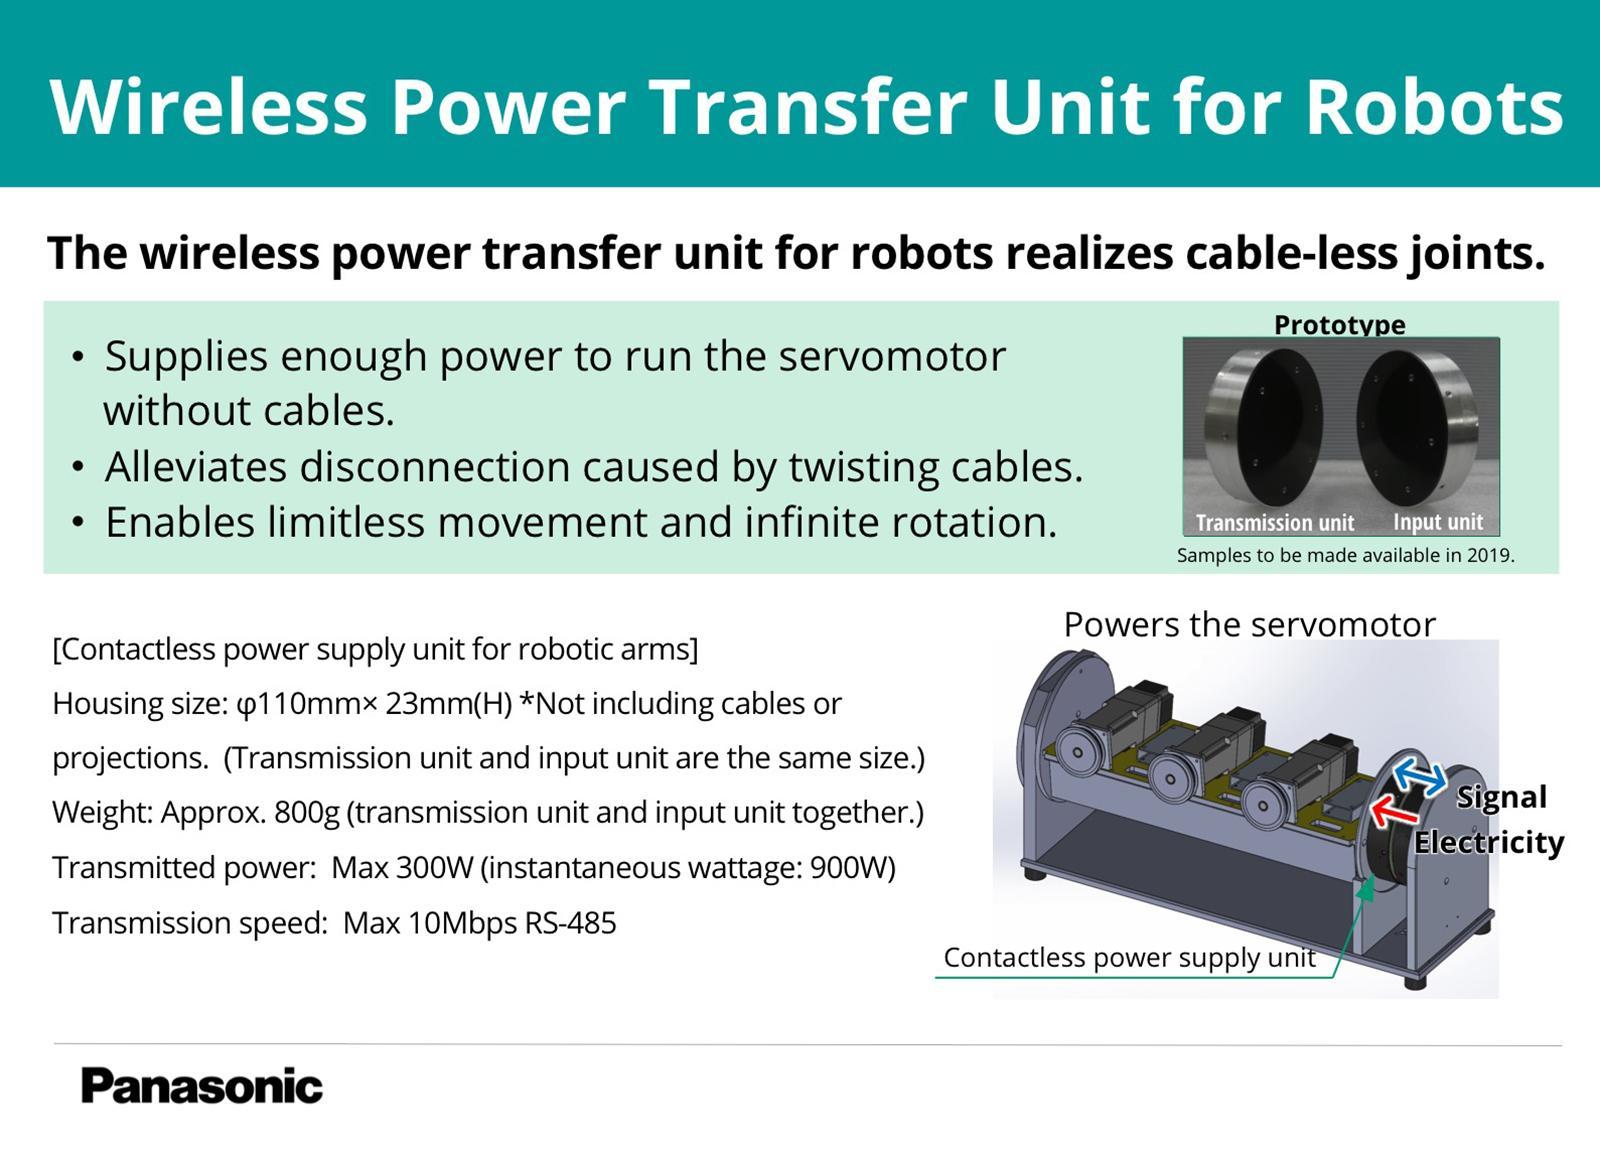 photo: Wireless Power Transfer Unit for Robots